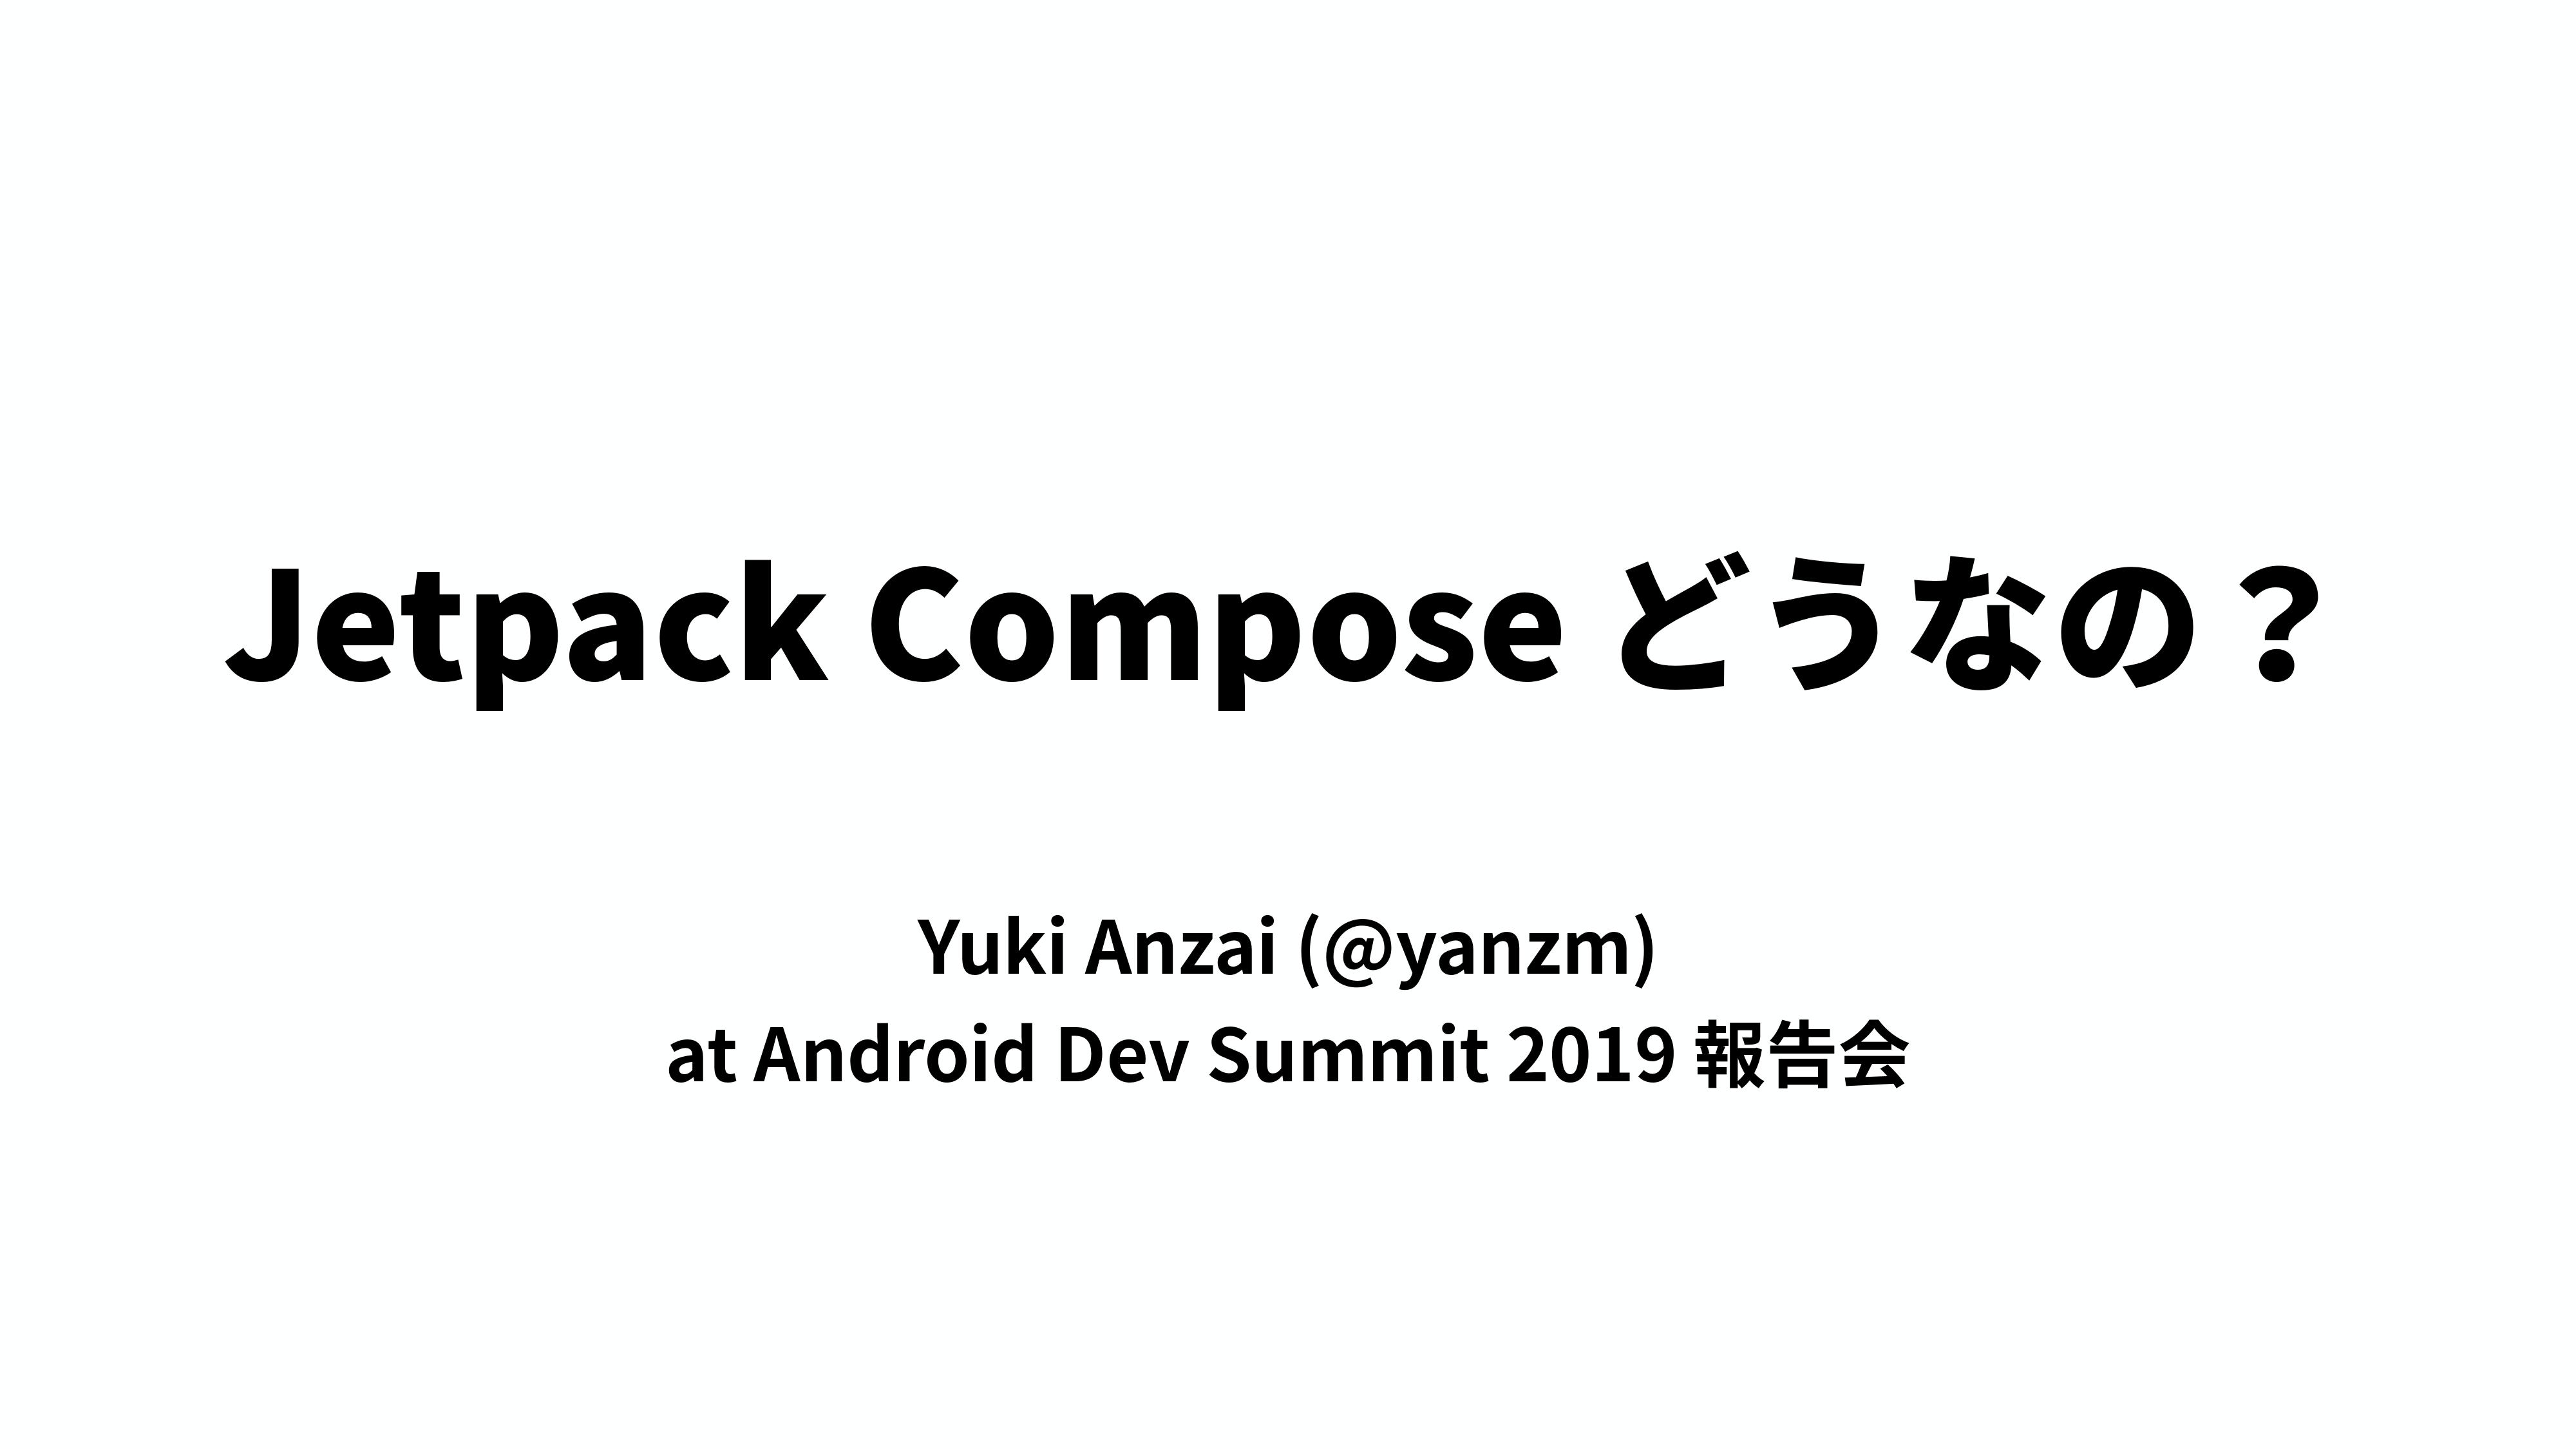 Jetpack Compose どうなの?(Android Dev Summit 2019報告会)by Yuki Anzai